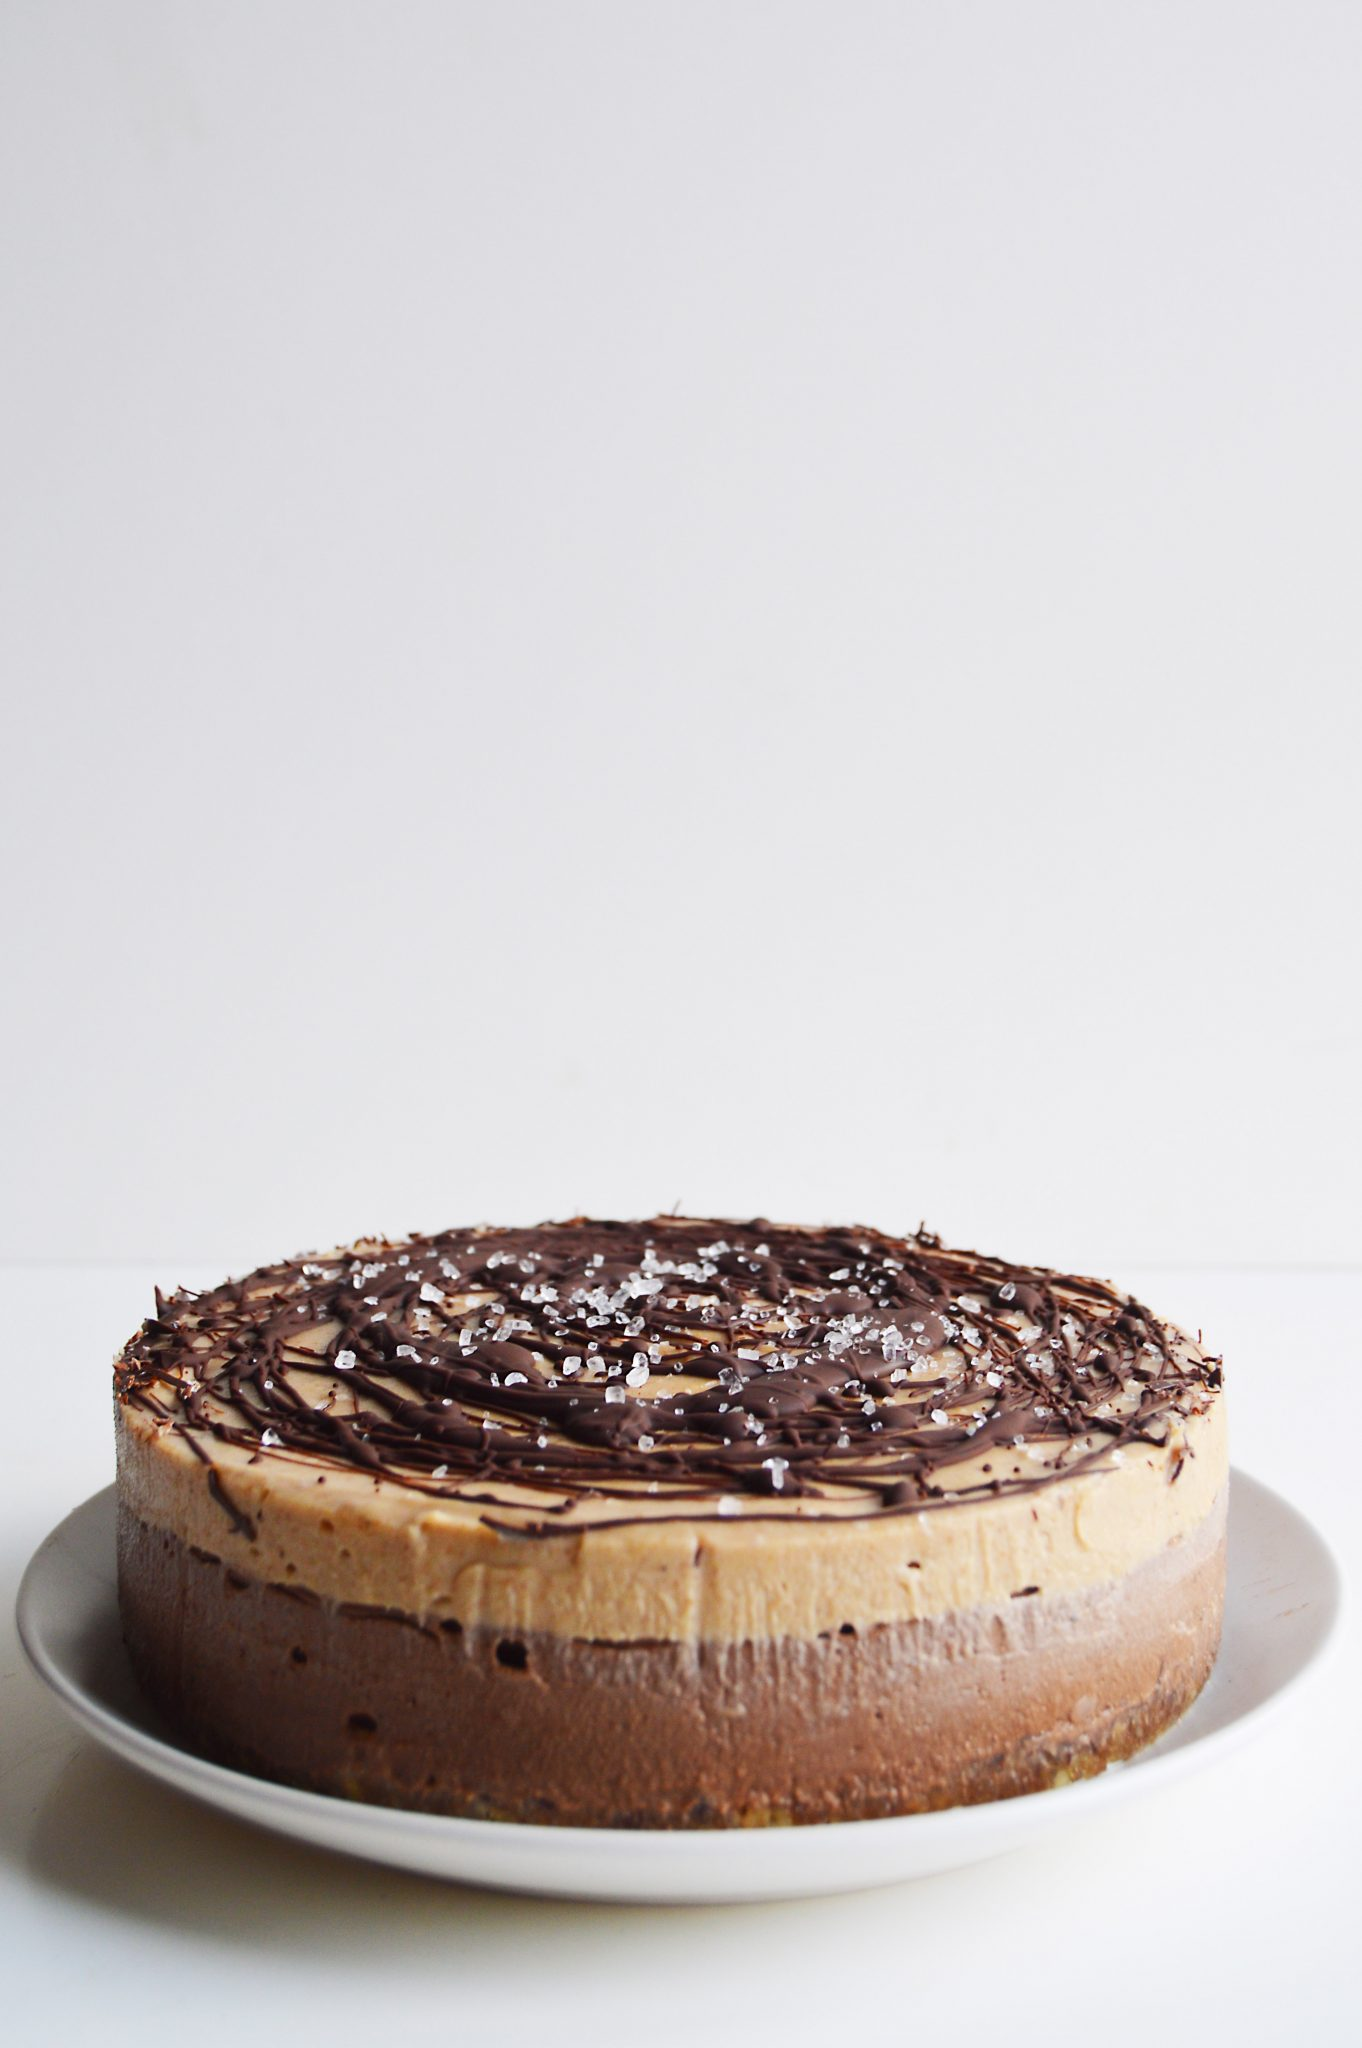 Vegan Chocolate & Salted Caramel Cheesecake - My Vibrant ...